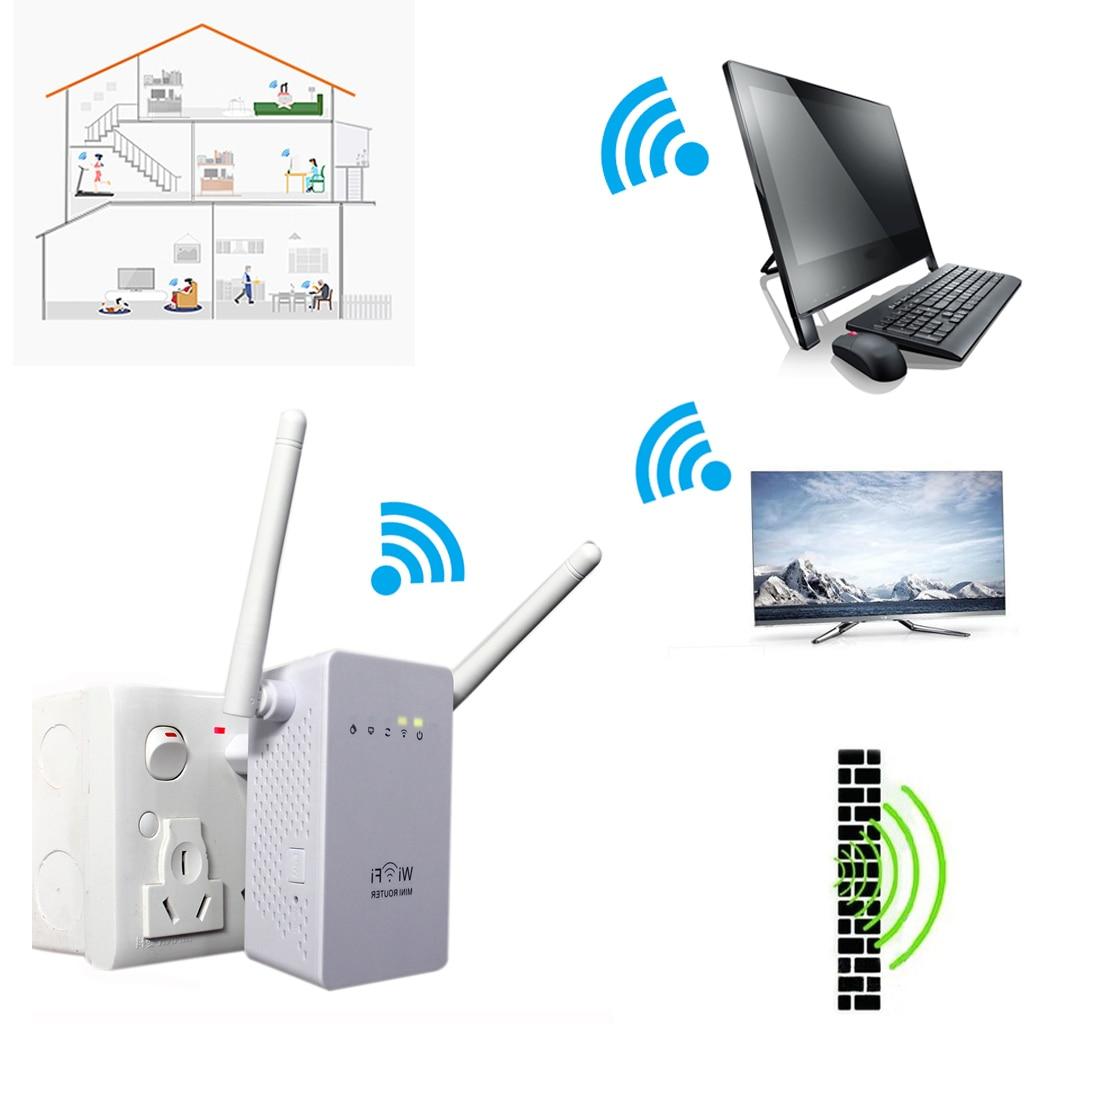 NOYOKERE 300Mbps WiFi Repeater Network Range Extender Booster N300 Single Increase Dual External Antennas EU US Plug